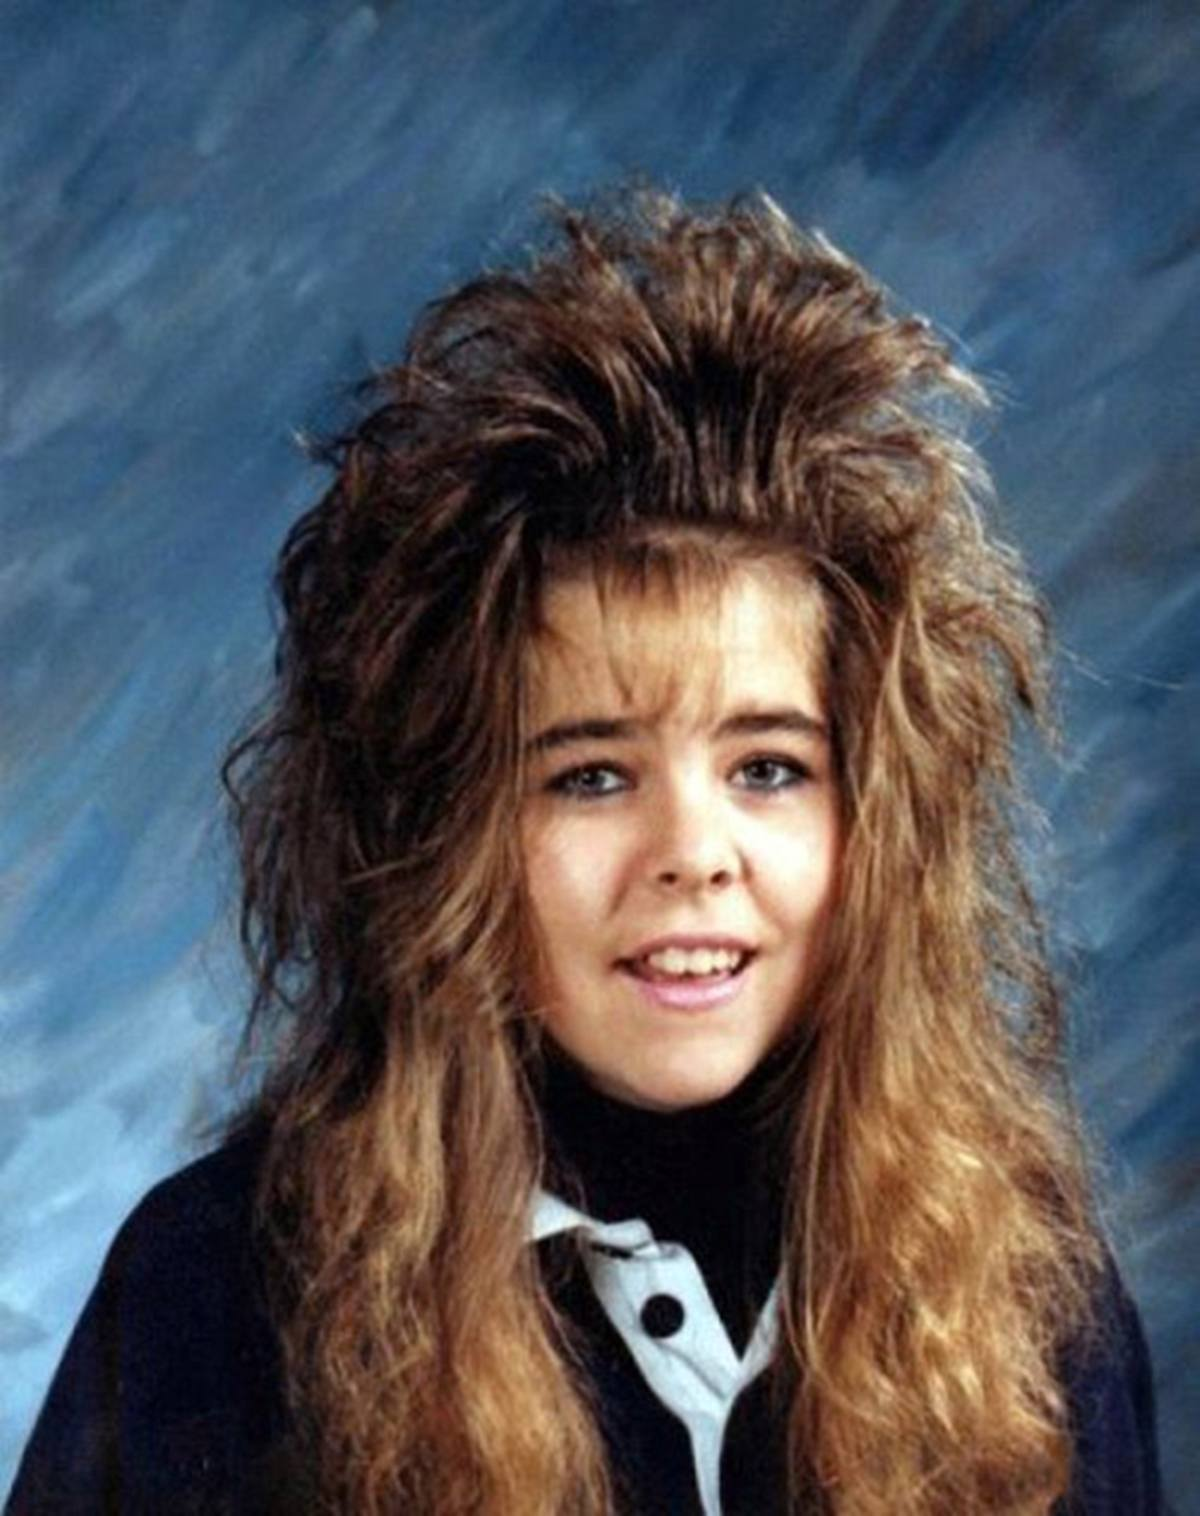 1 3 15 Hilariously Awkward Yearbook Photos